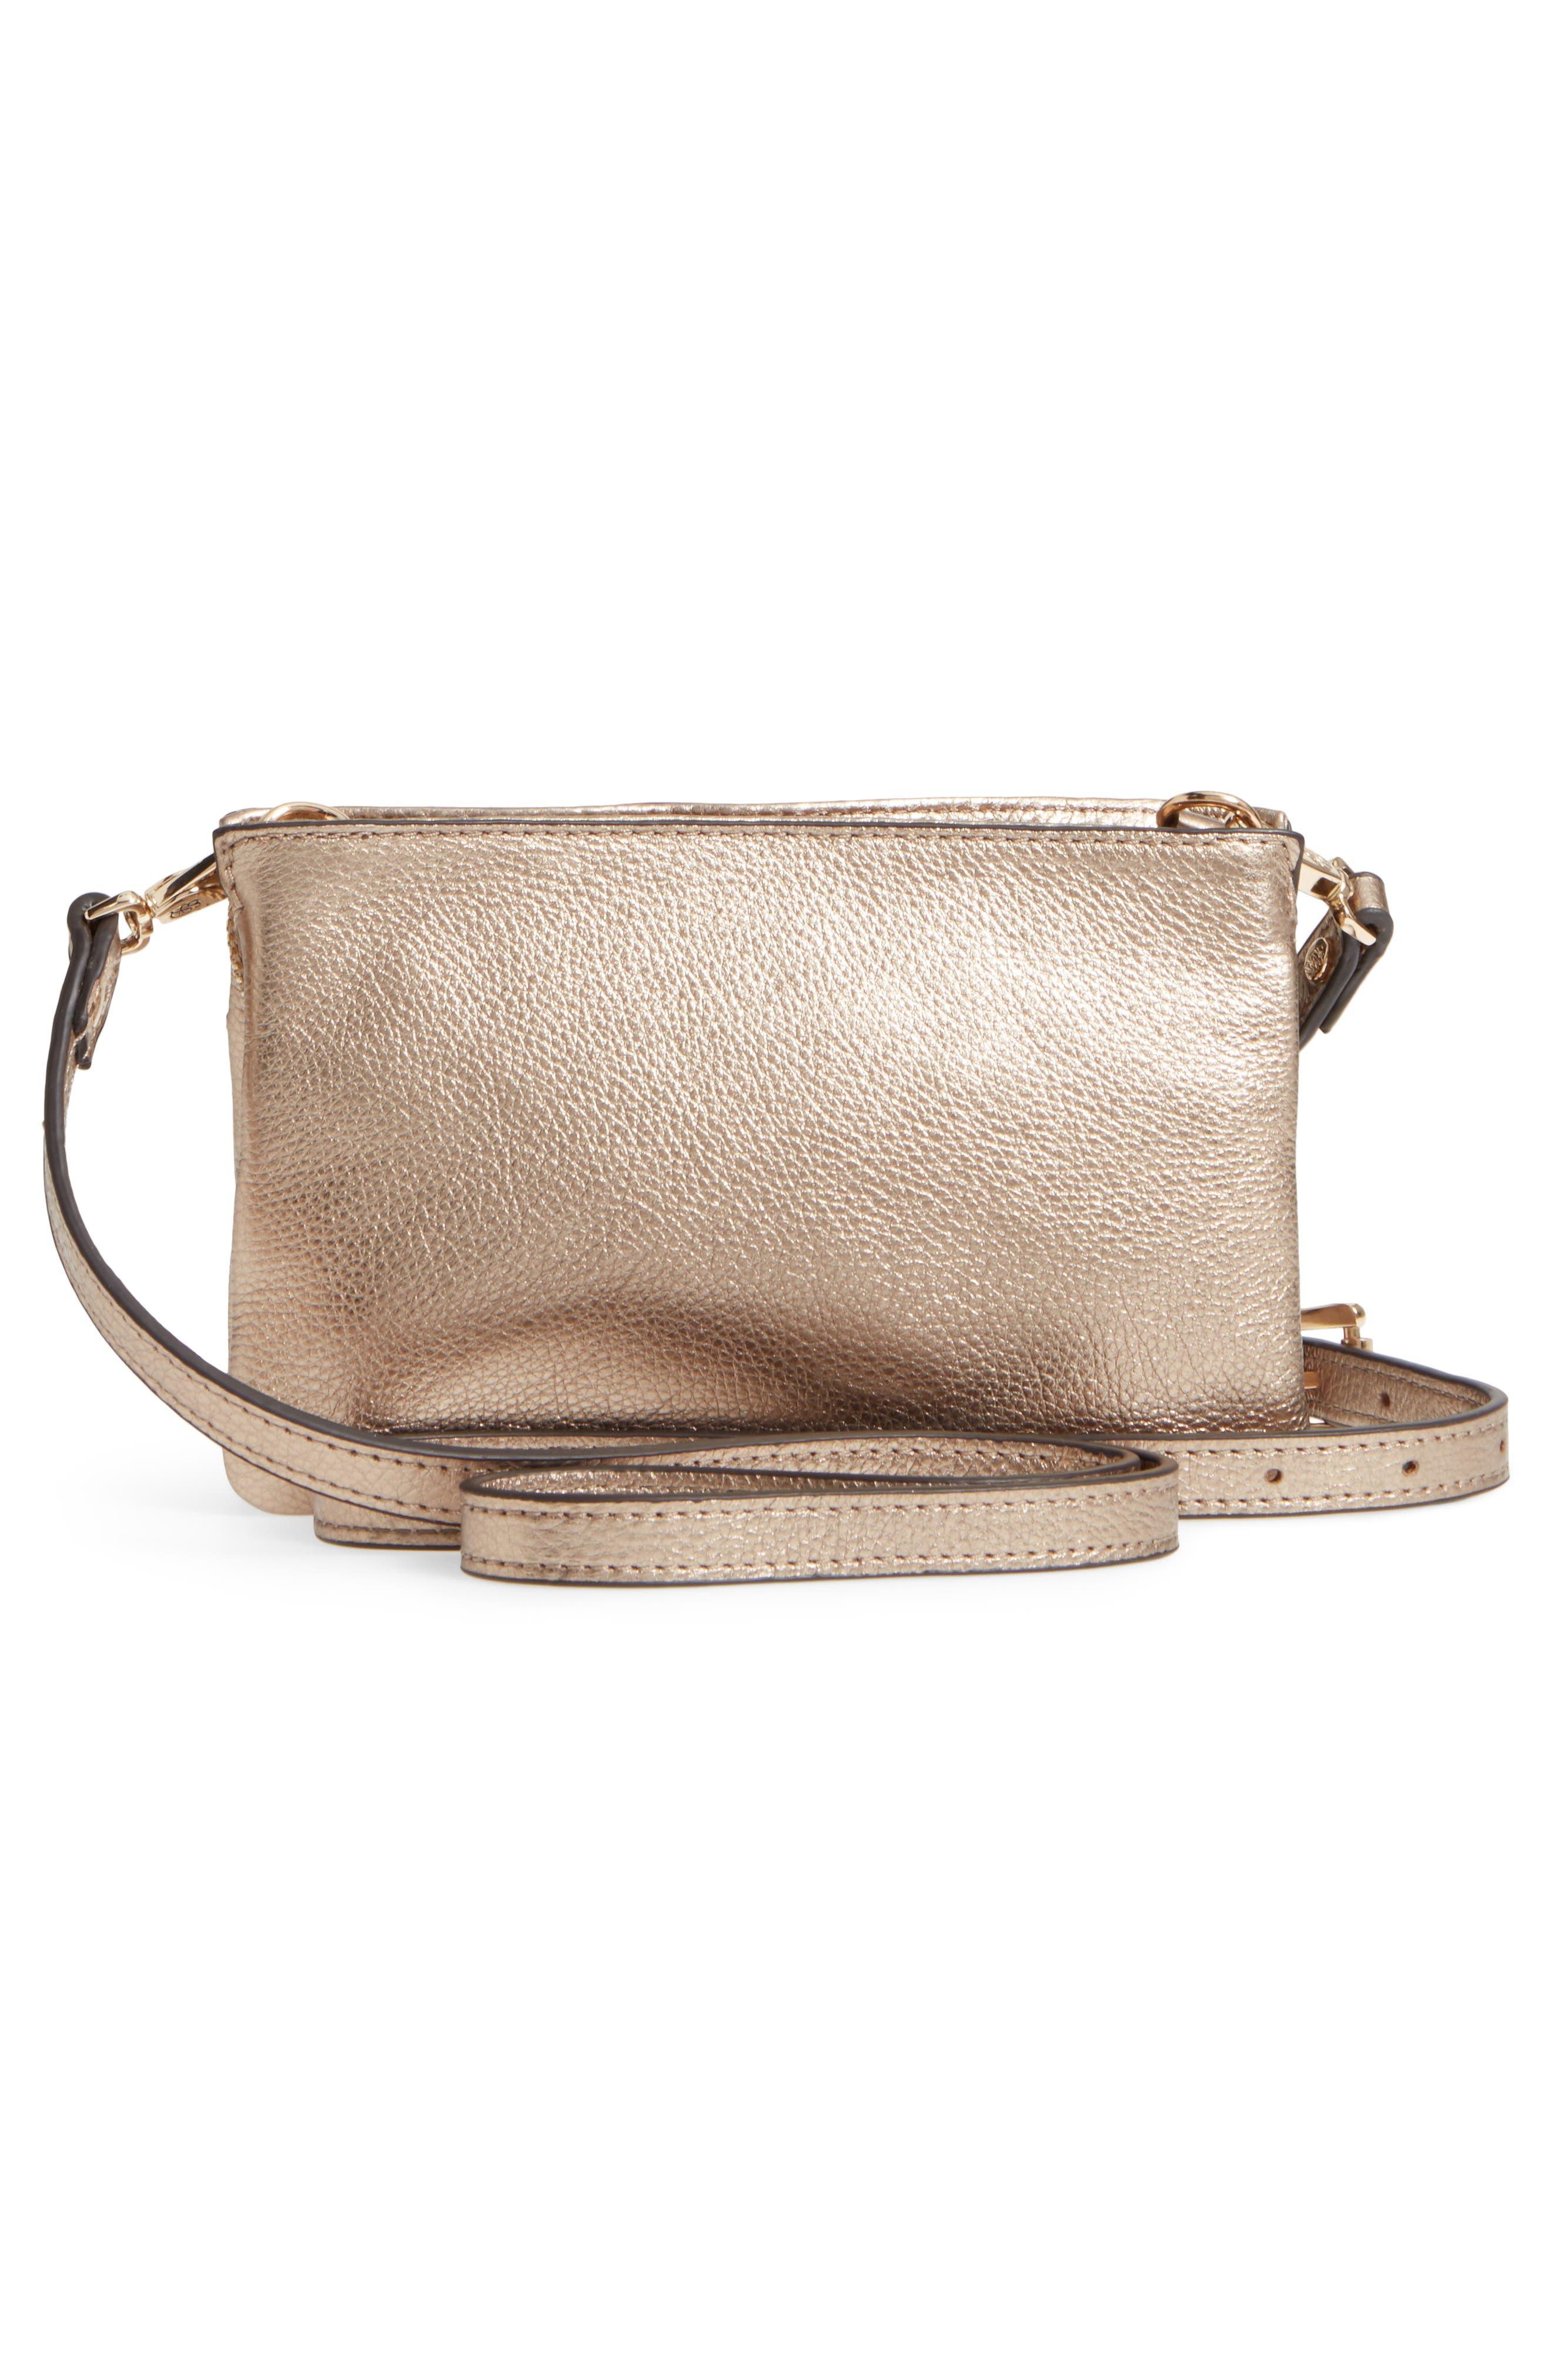 Katerini Leather Crossbody Wallet,                             Alternate thumbnail 14, color,